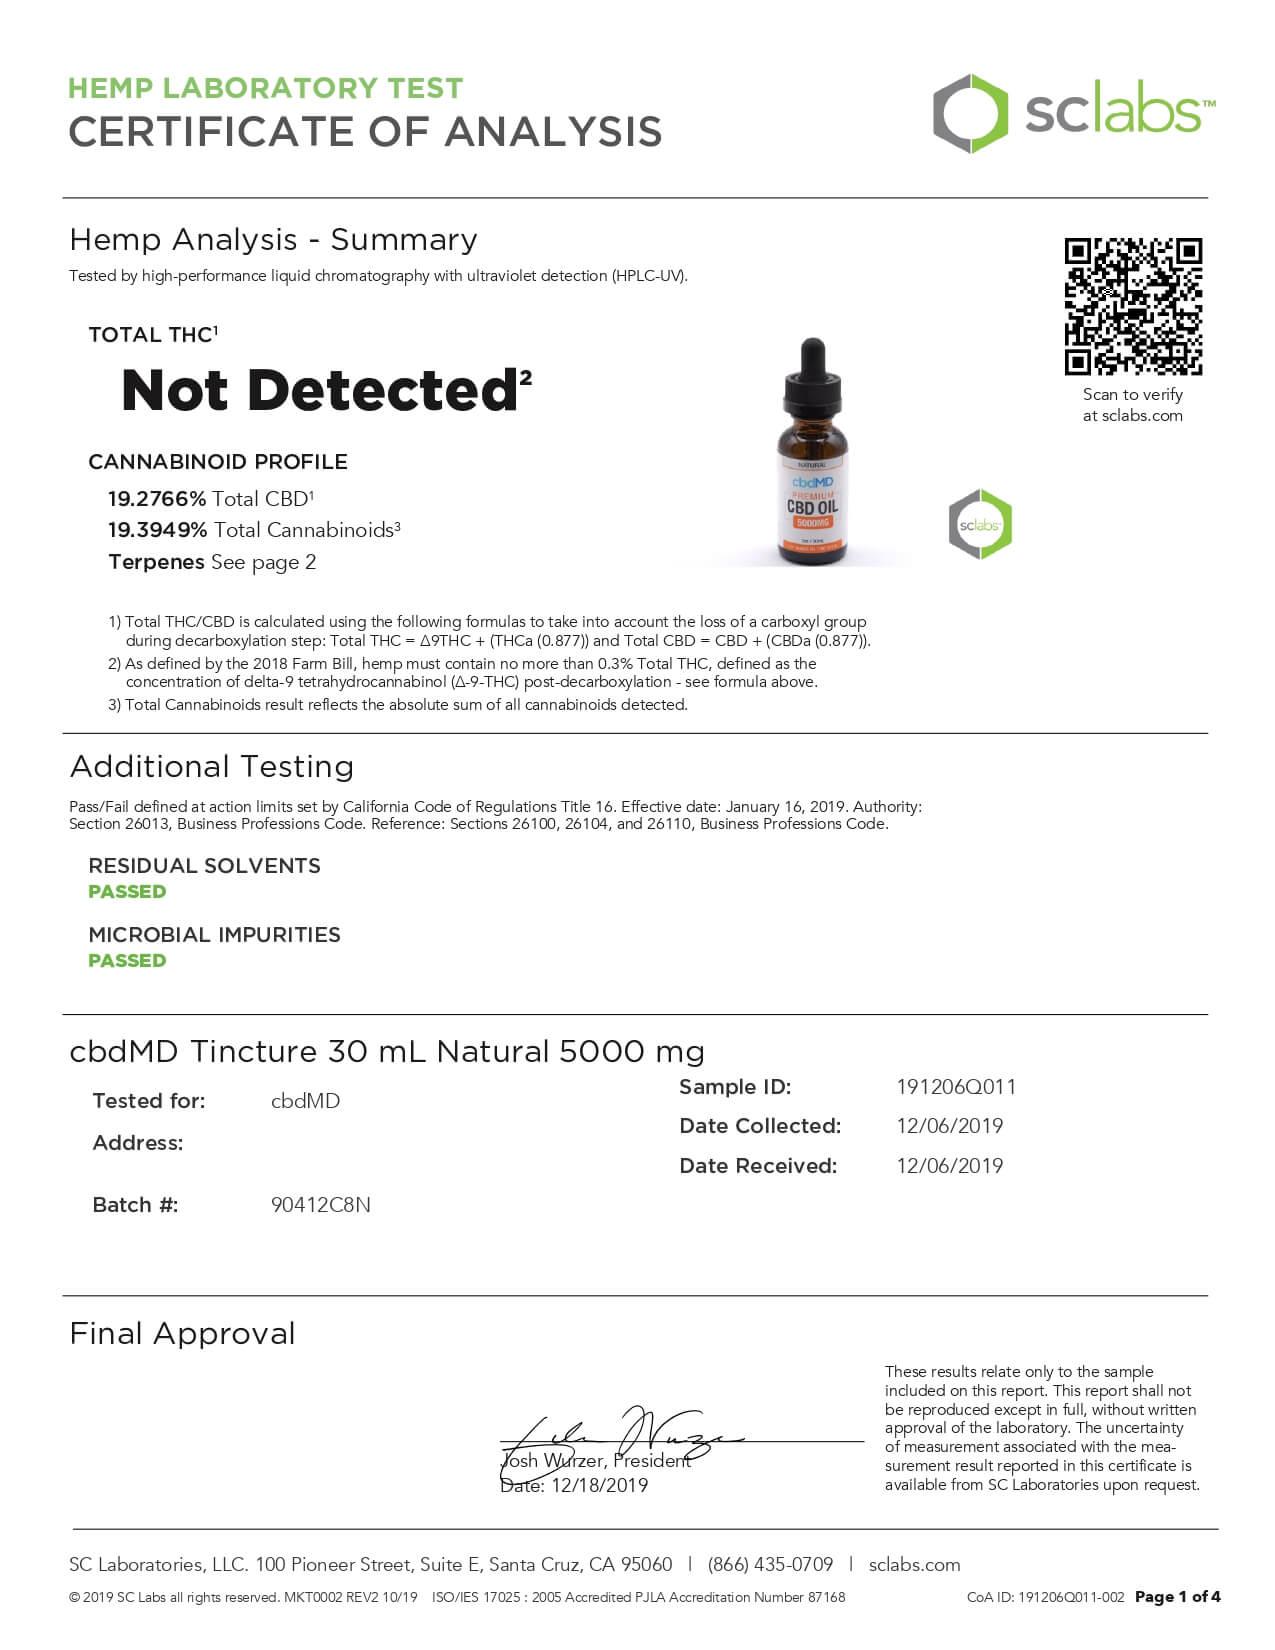 cbdMD CBD Tincture Broad Specrum Natural 30ml 5000mg Lab Report